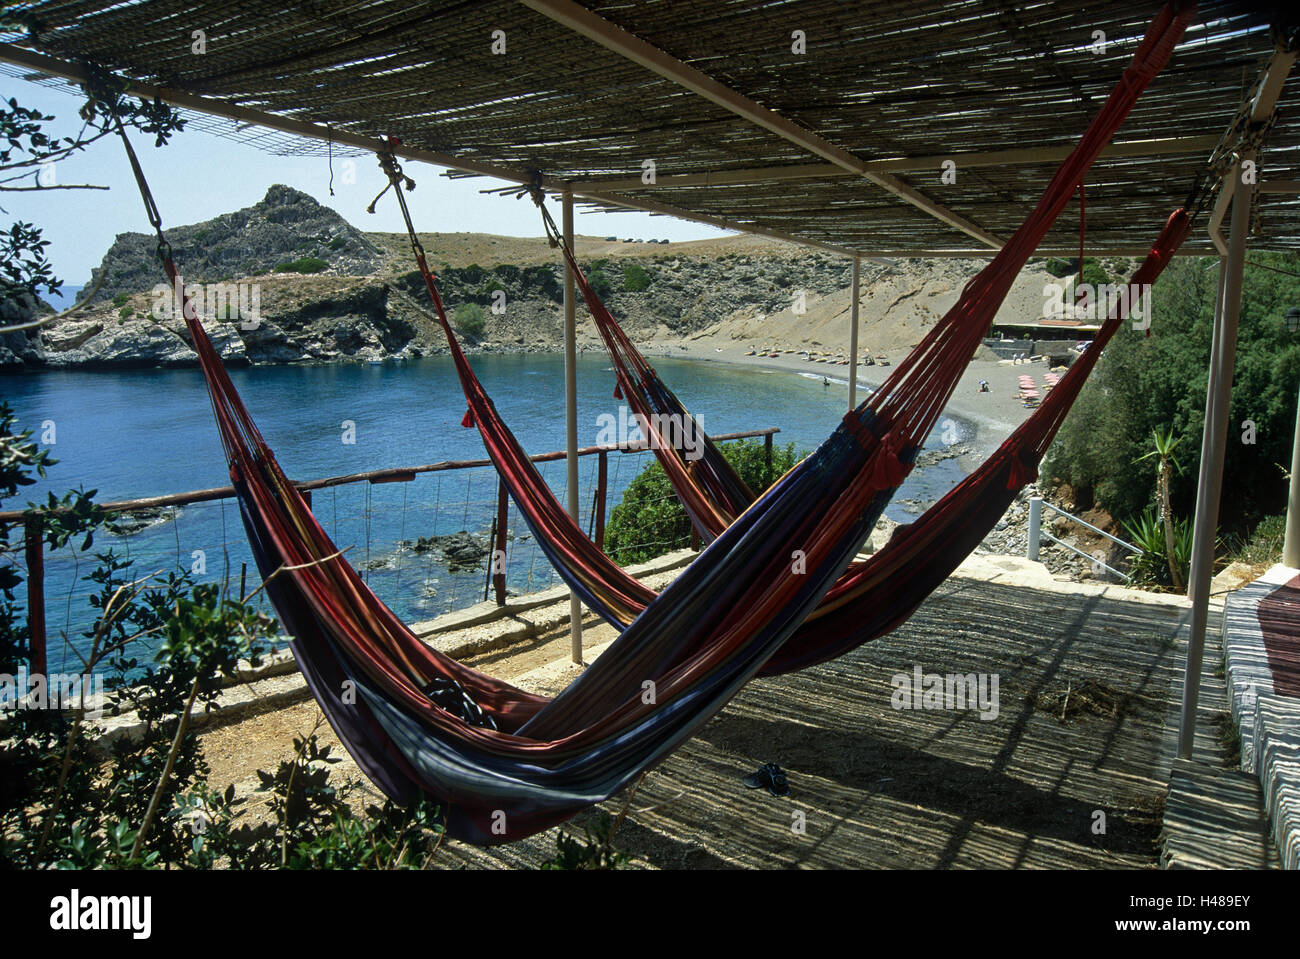 Greece, Crete, agio Pavlos, terrace, hammocks, bay, - Stock Image